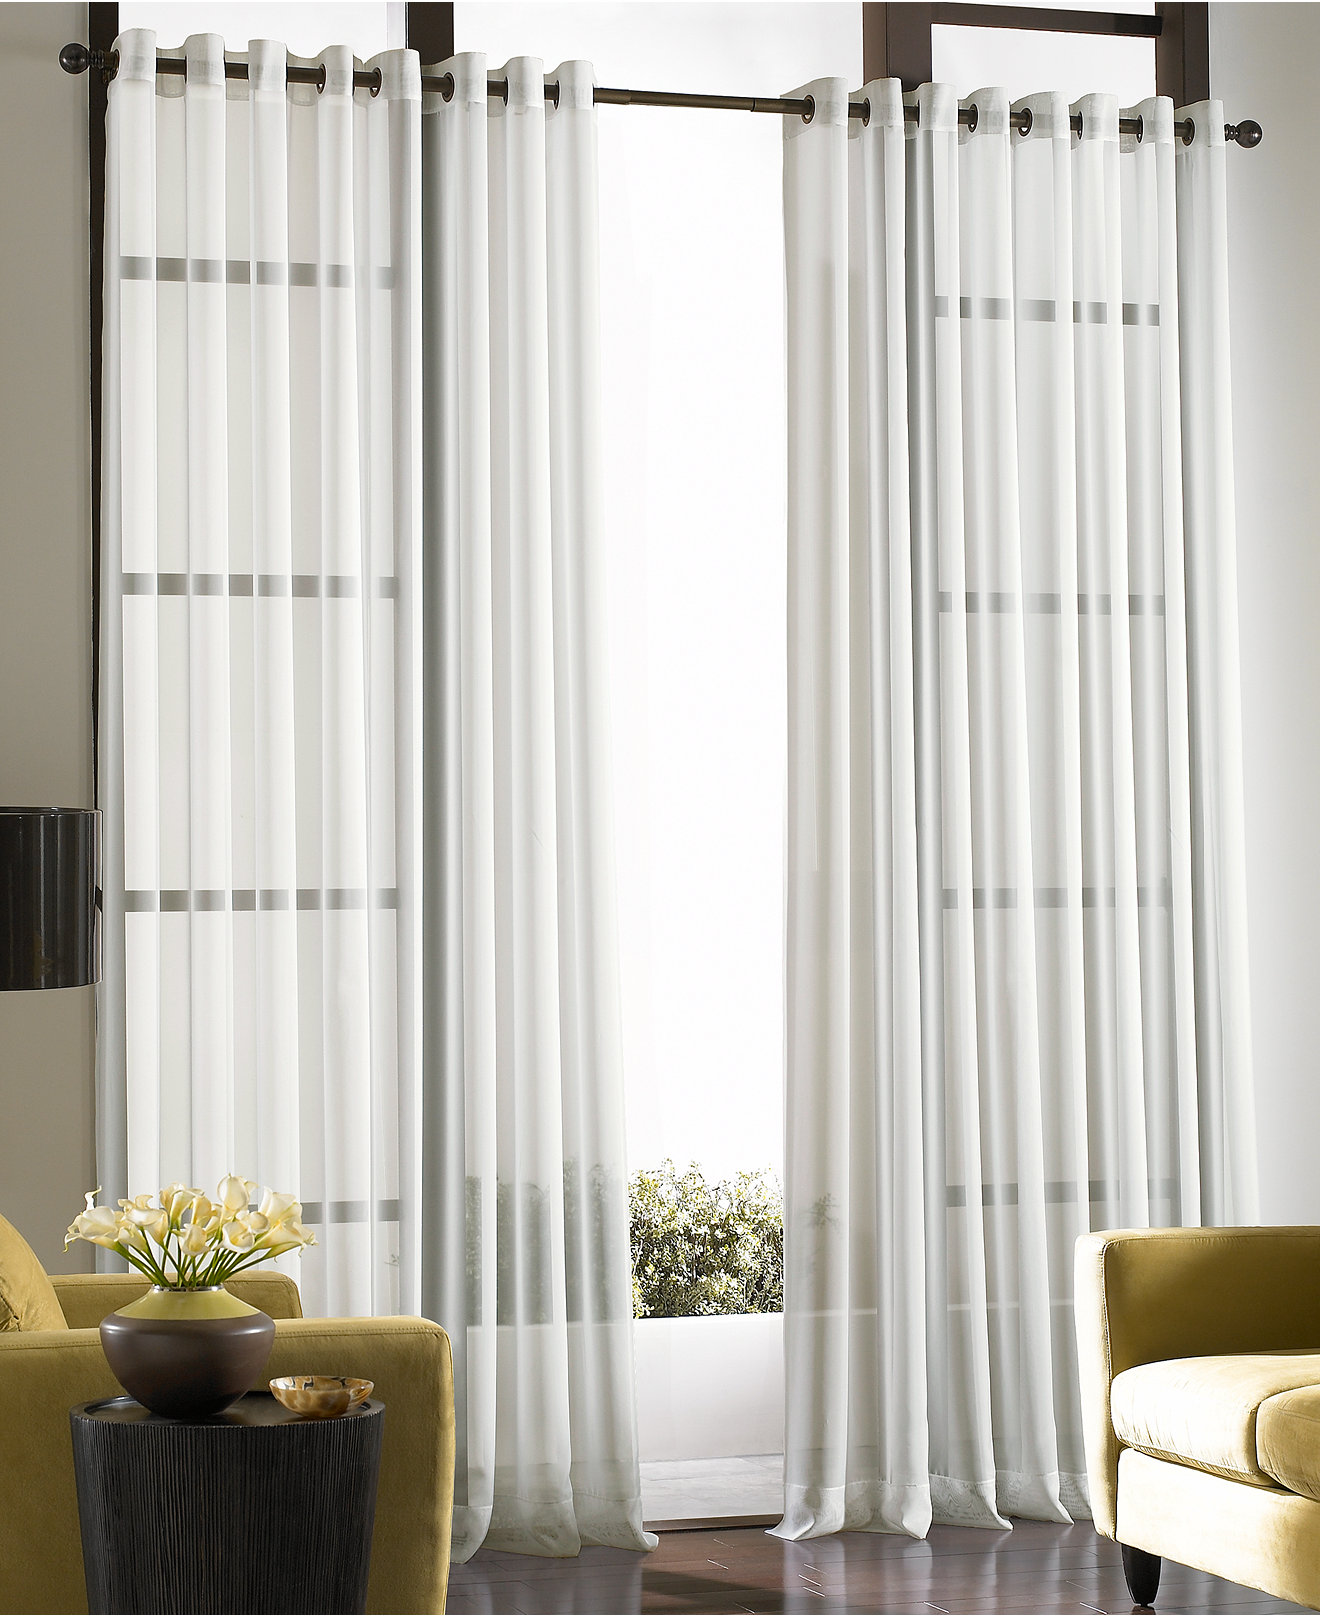 Curtains Macys Gorgeous Curtains Living Room For Macy 39 S Curtains For Living Room Noivmwc